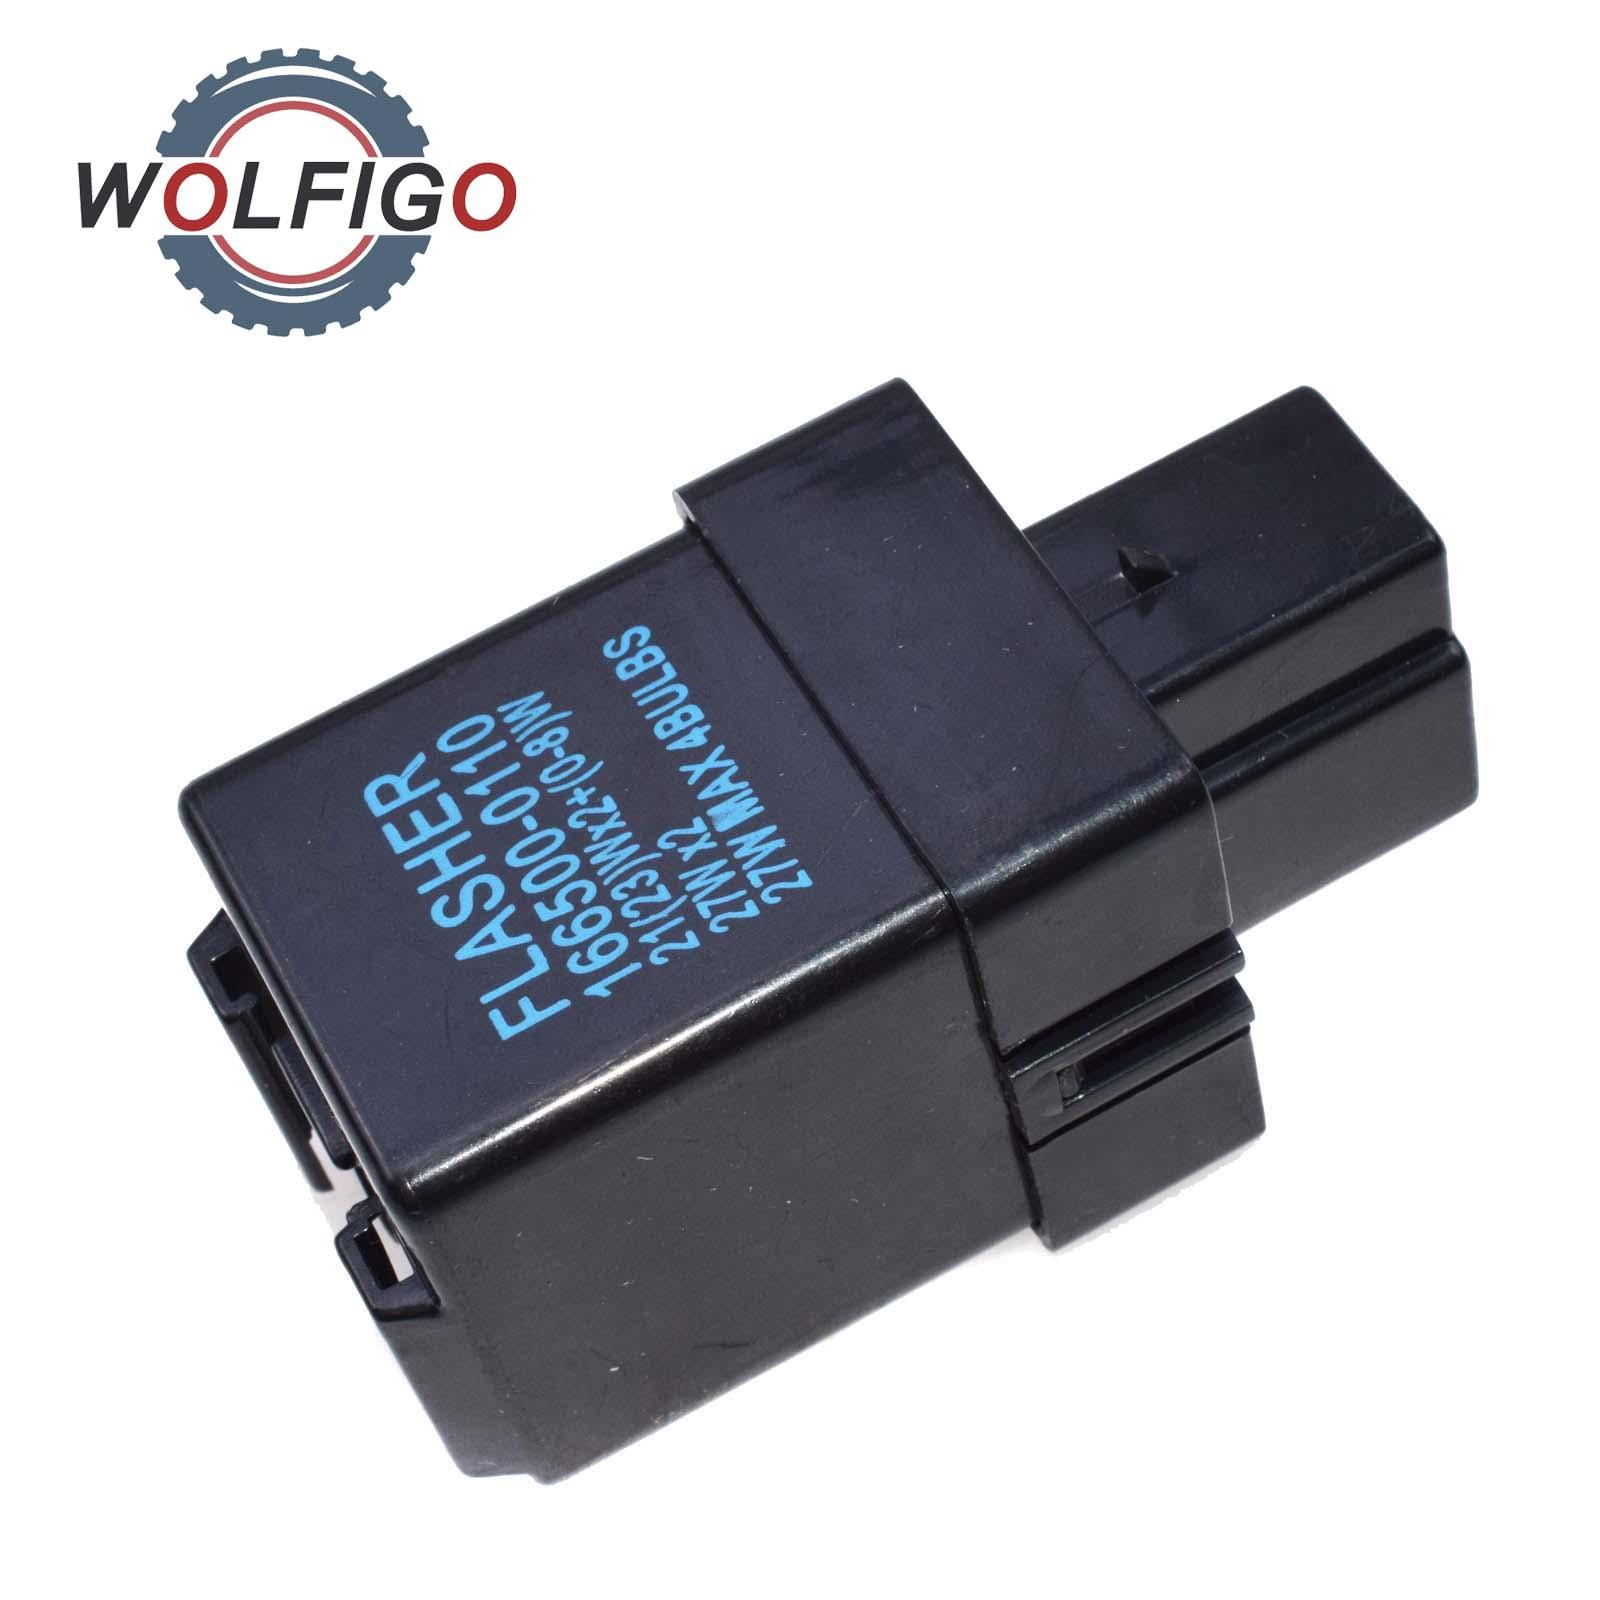 WOLFIGO 3-Pin señal Flasher Relay para Toyota 4 RUNNER Corolla Toyota Camry Tercel Celica LANDCRUISER PICKUP 1984- 1989, 81980-16010